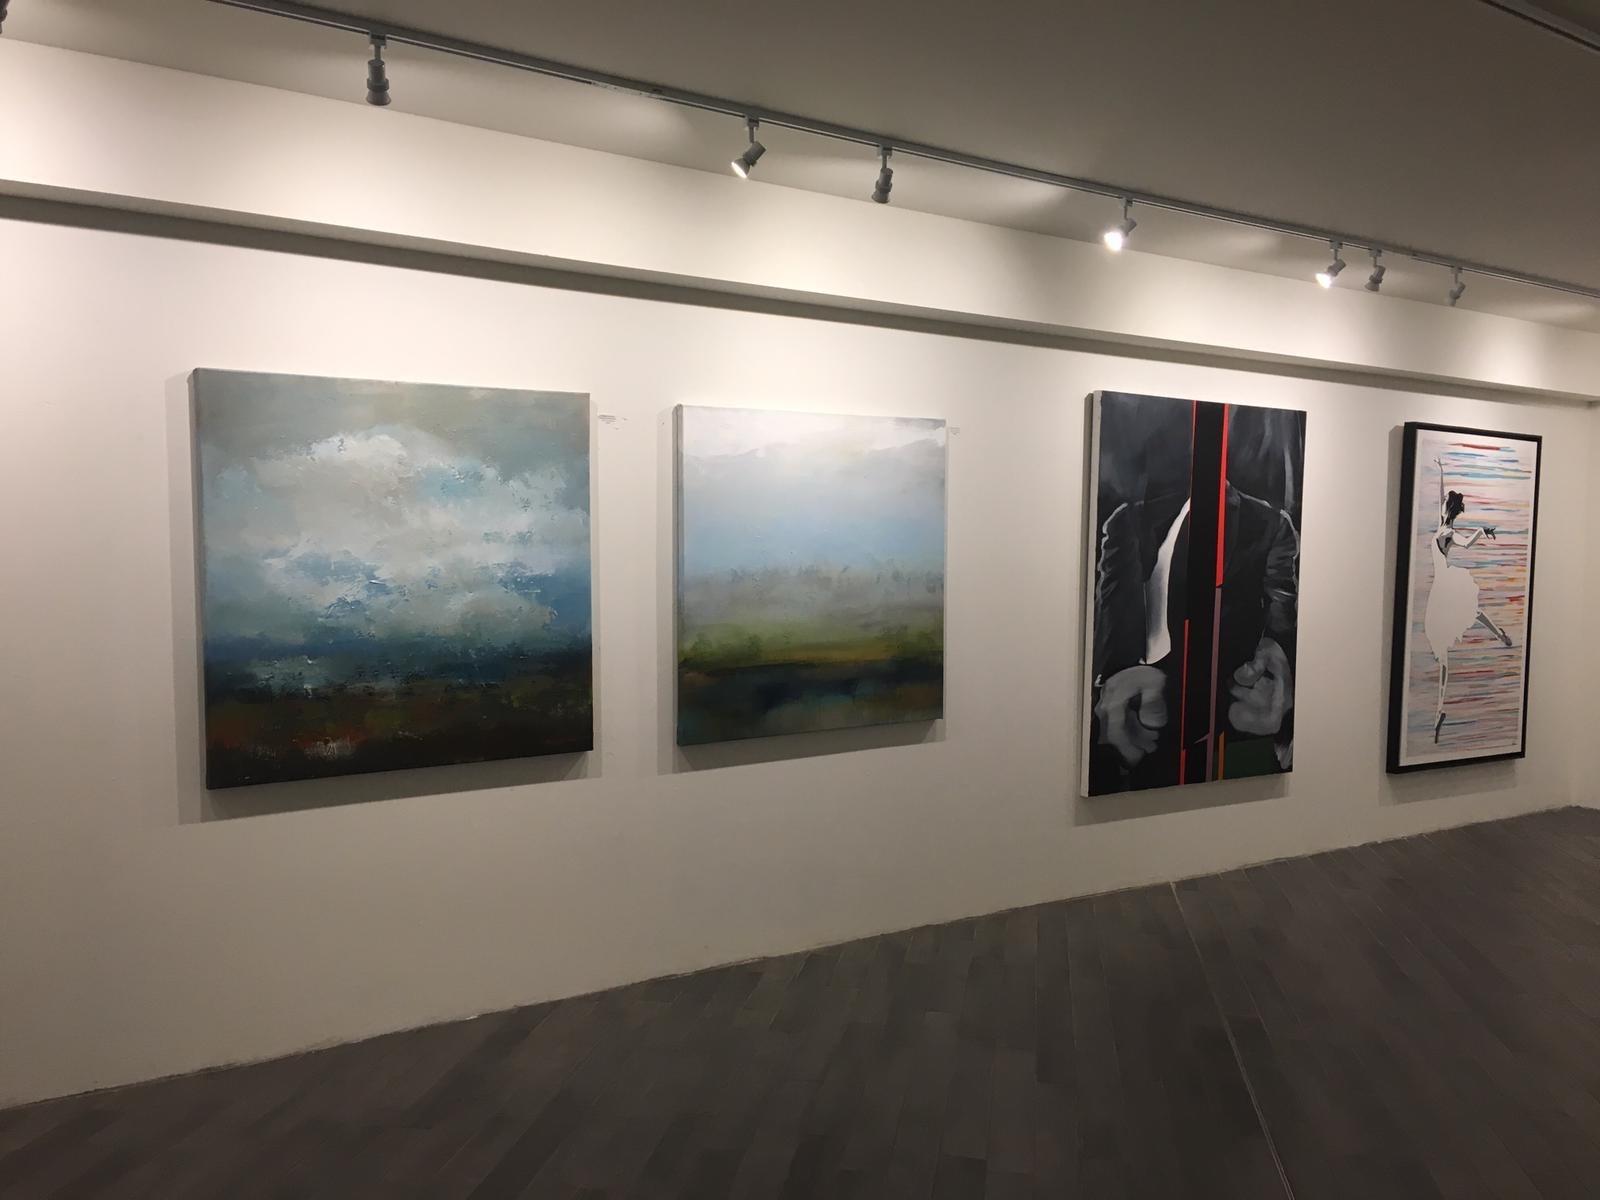 Works on exhibit in Dublin, Ireland